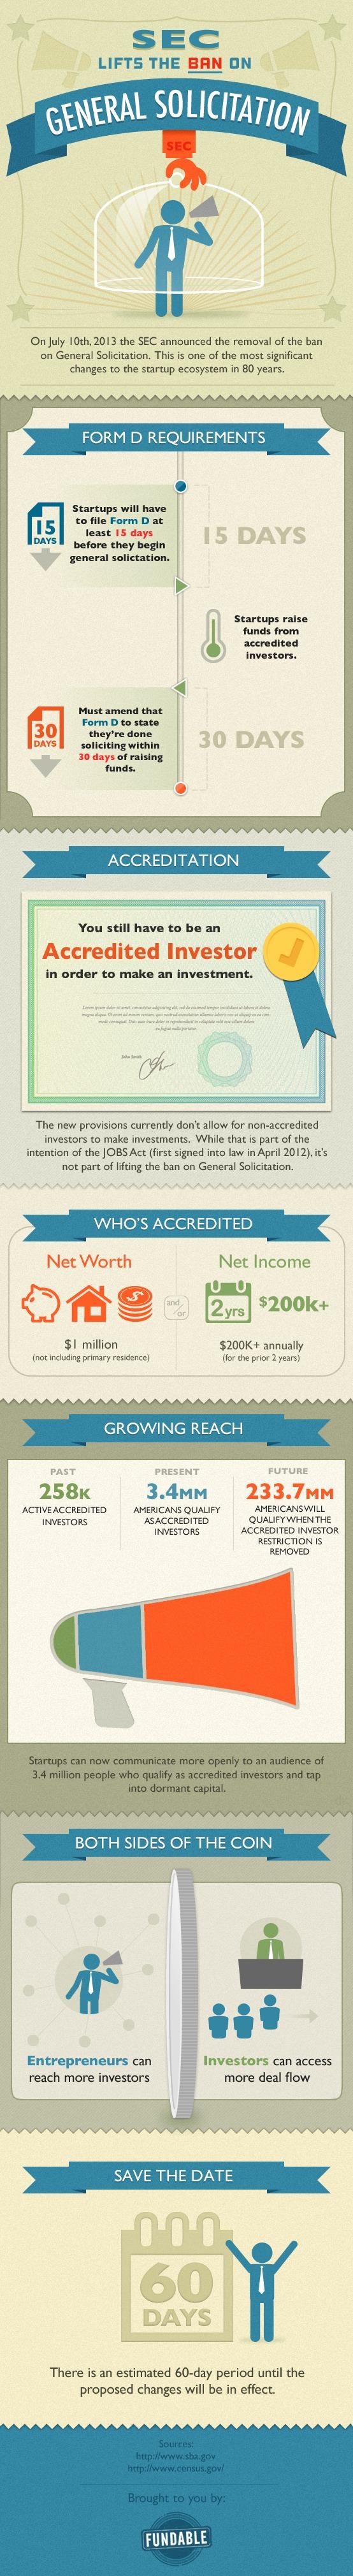 SEC General Solicitation Infographic